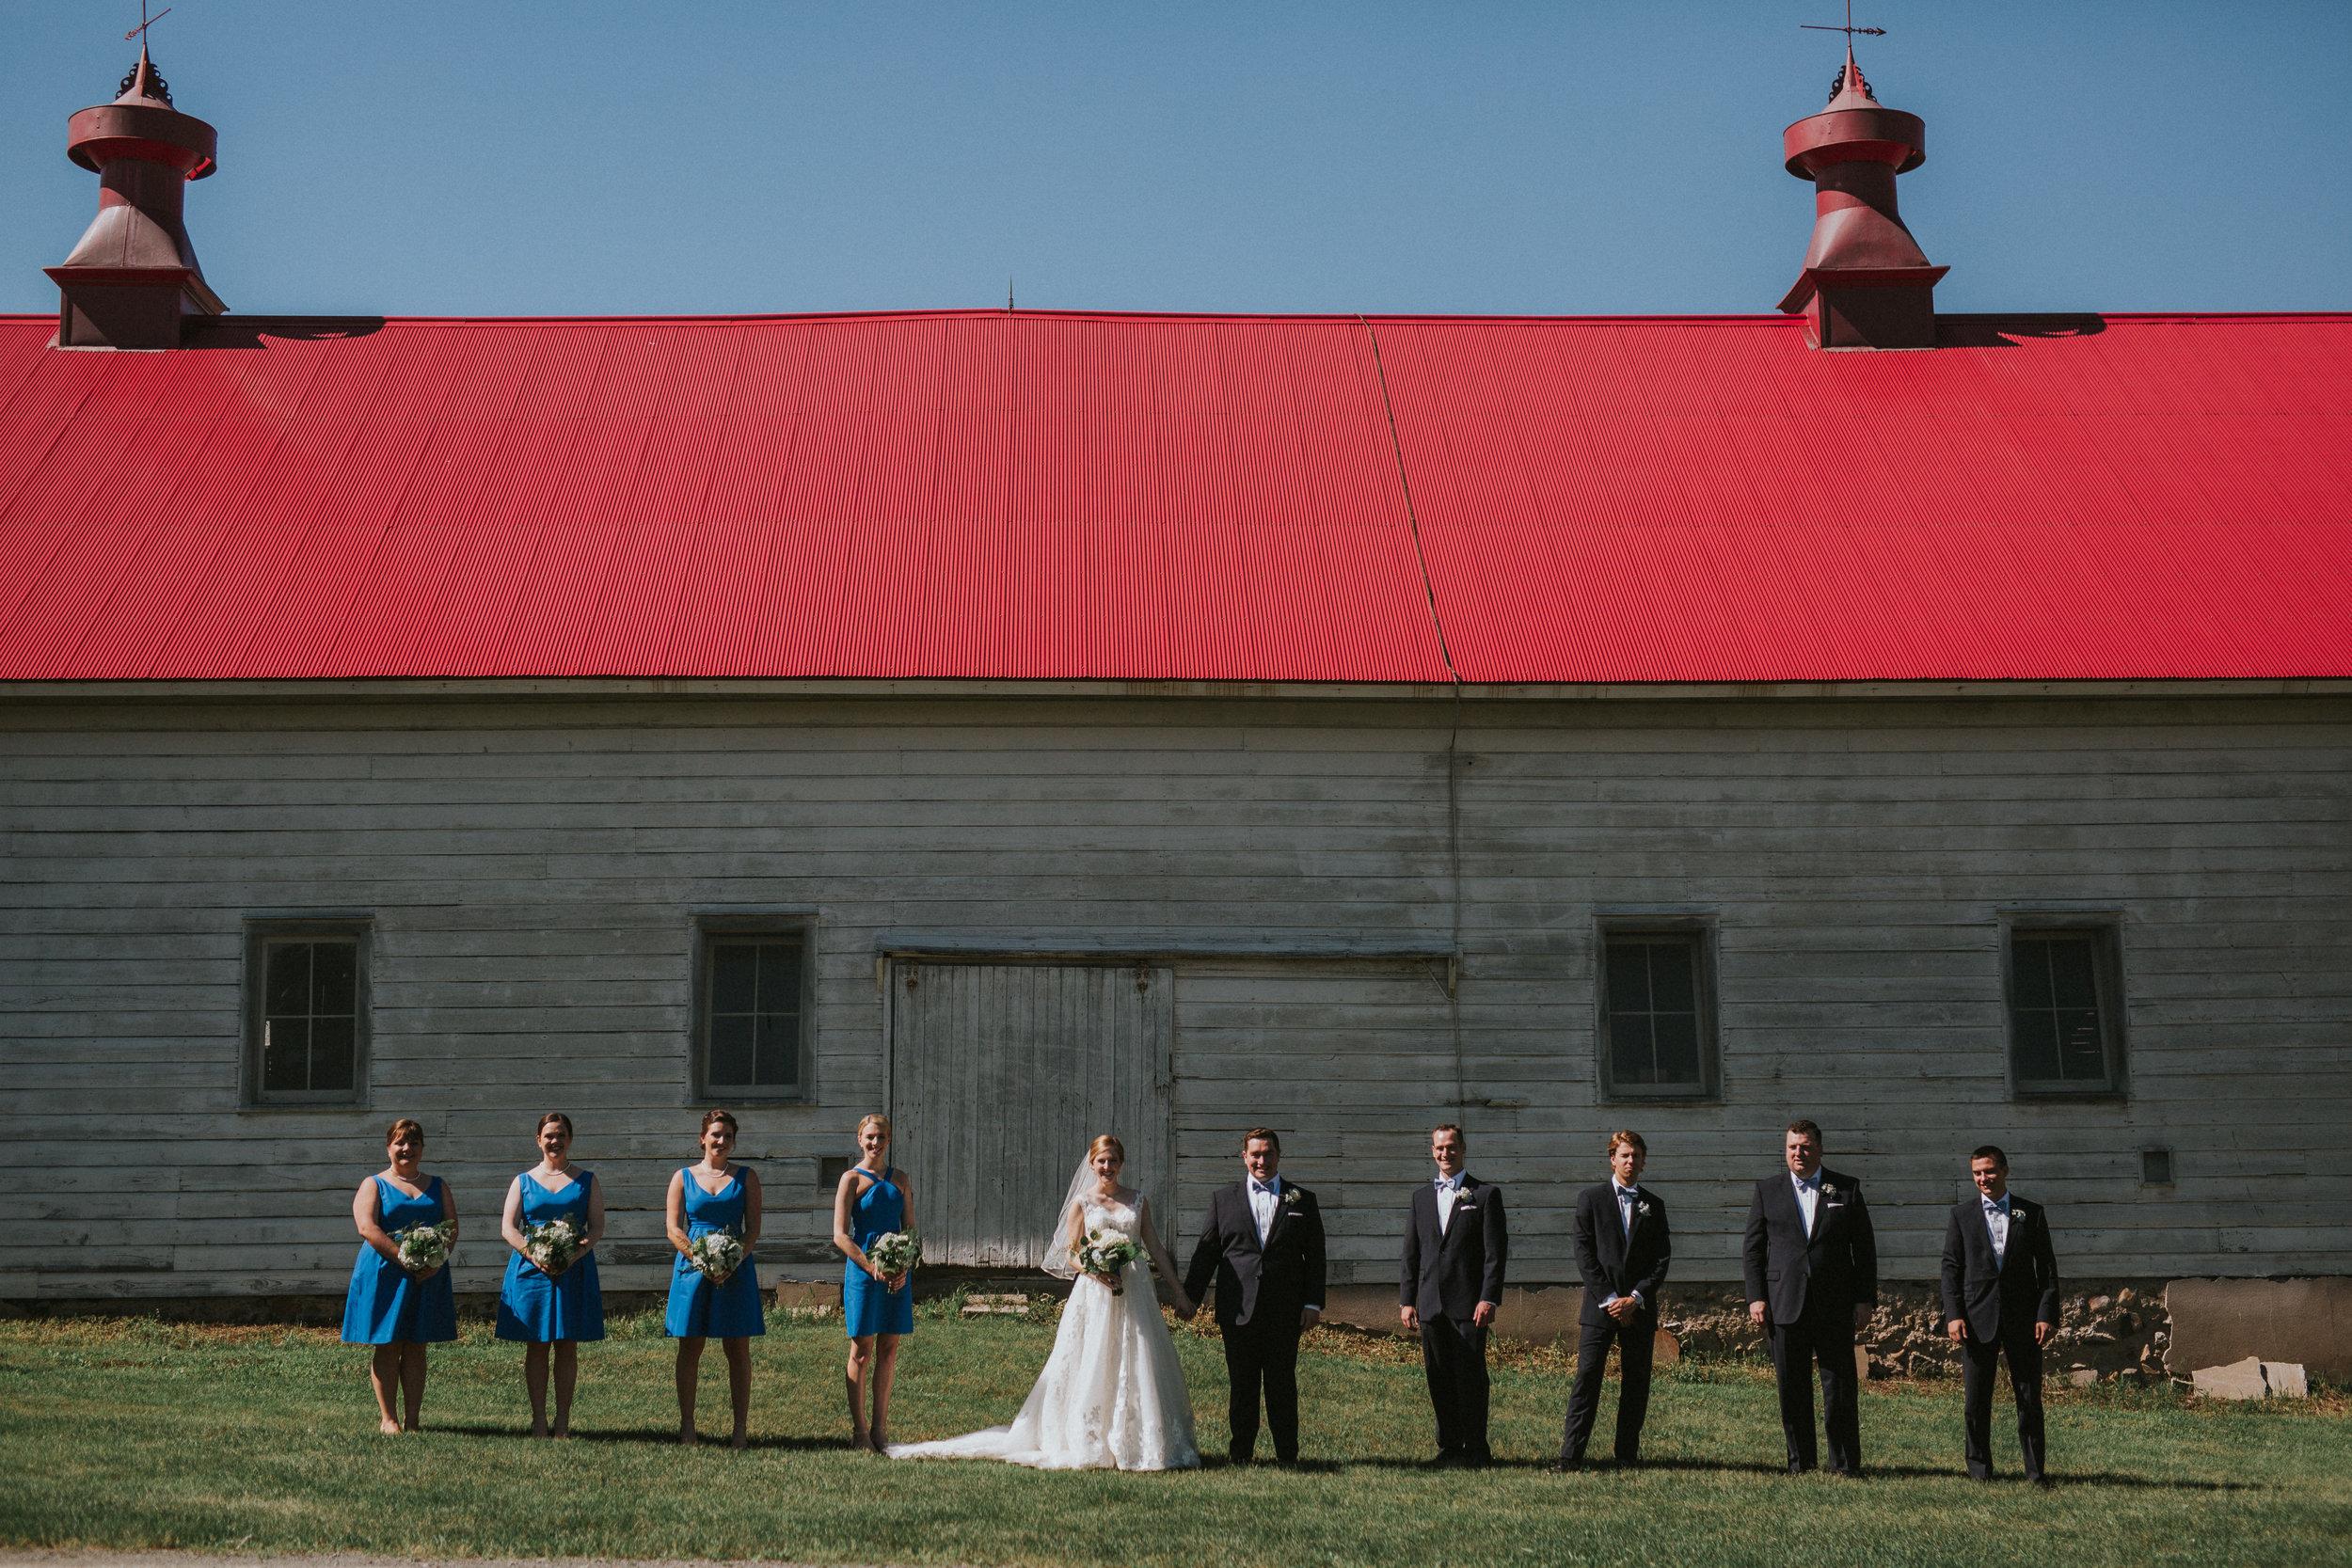 shaker_heritage_wedding_0040.JPG